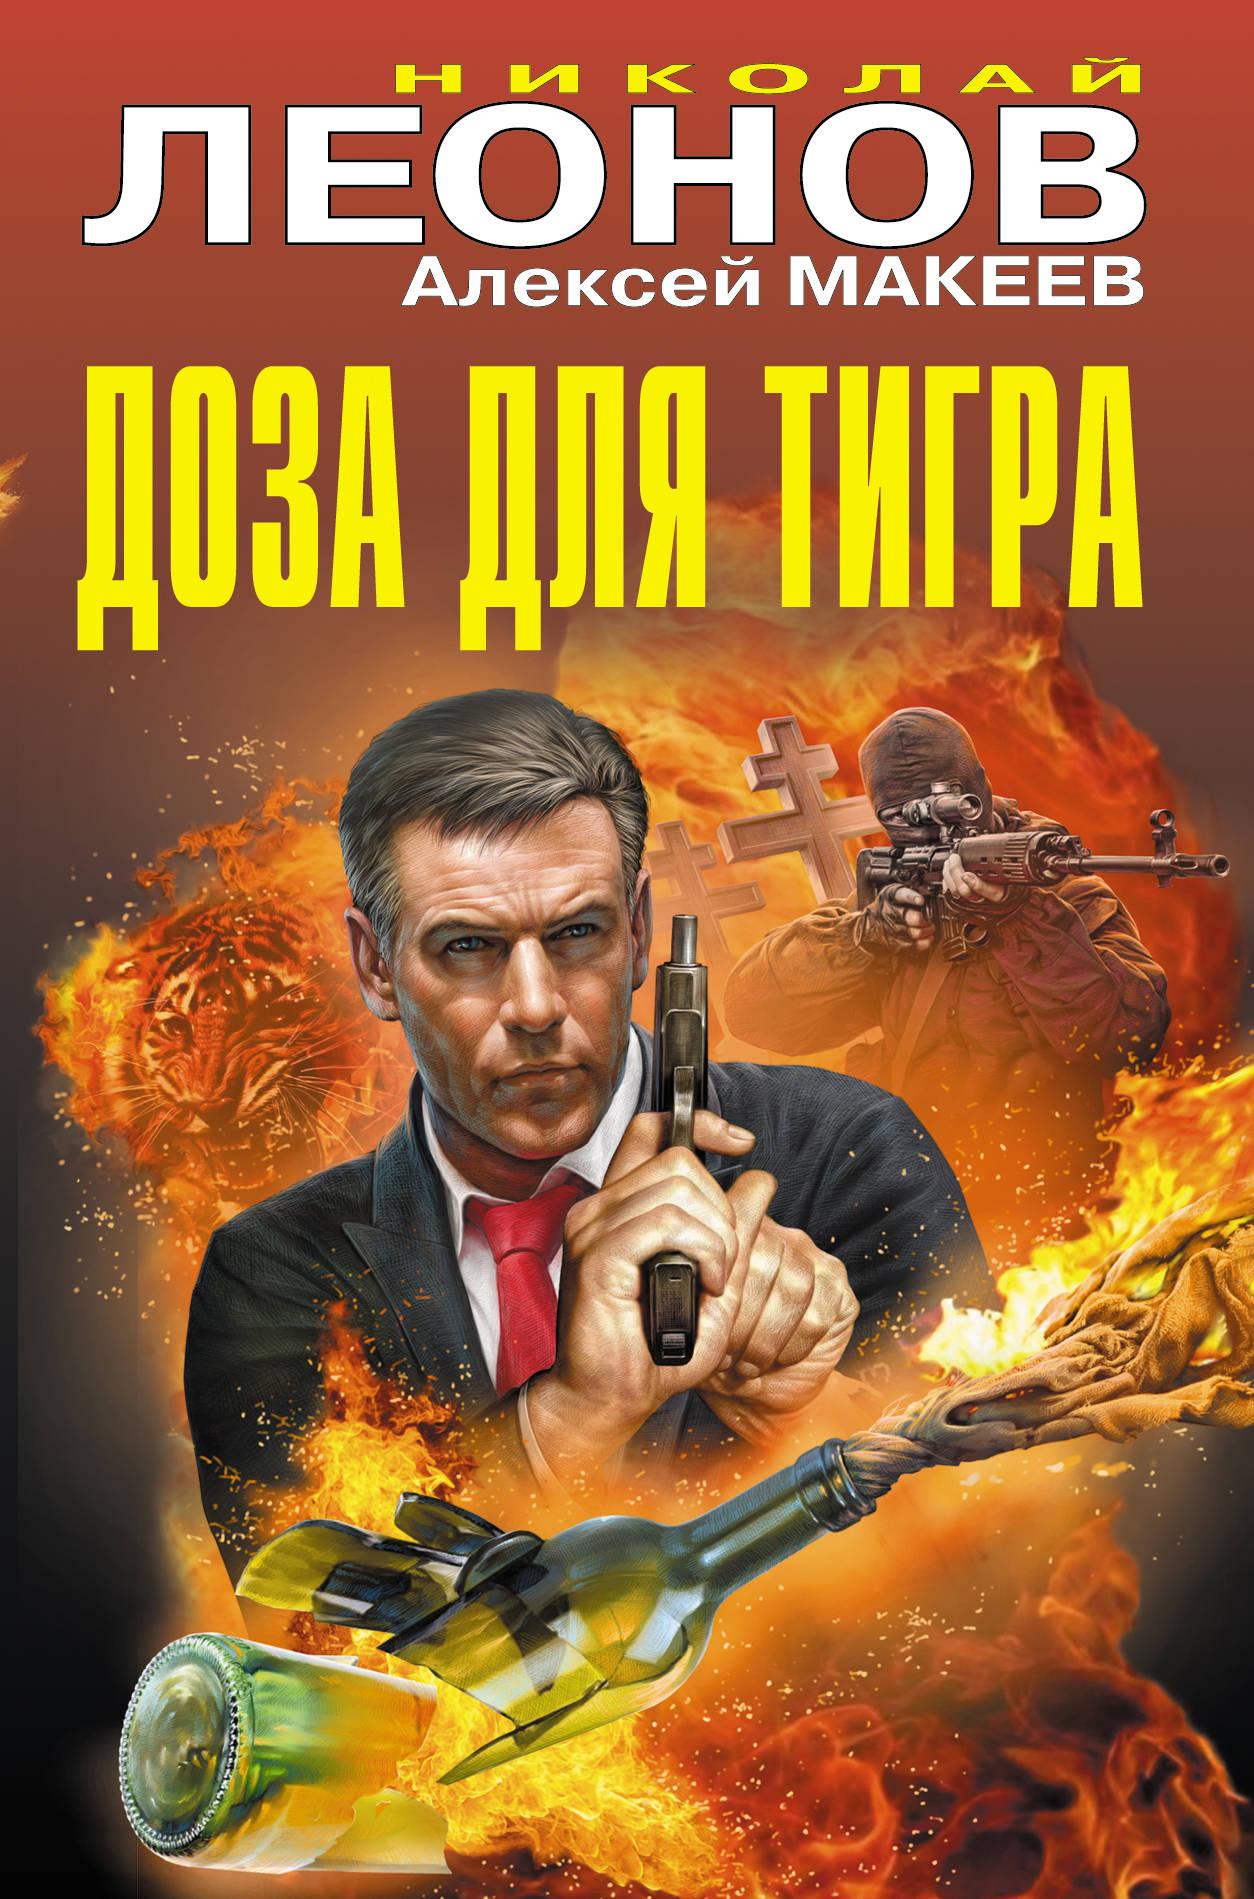 Леонов Николай Иванович; Макеев Алексей Викторович Доза для тигра